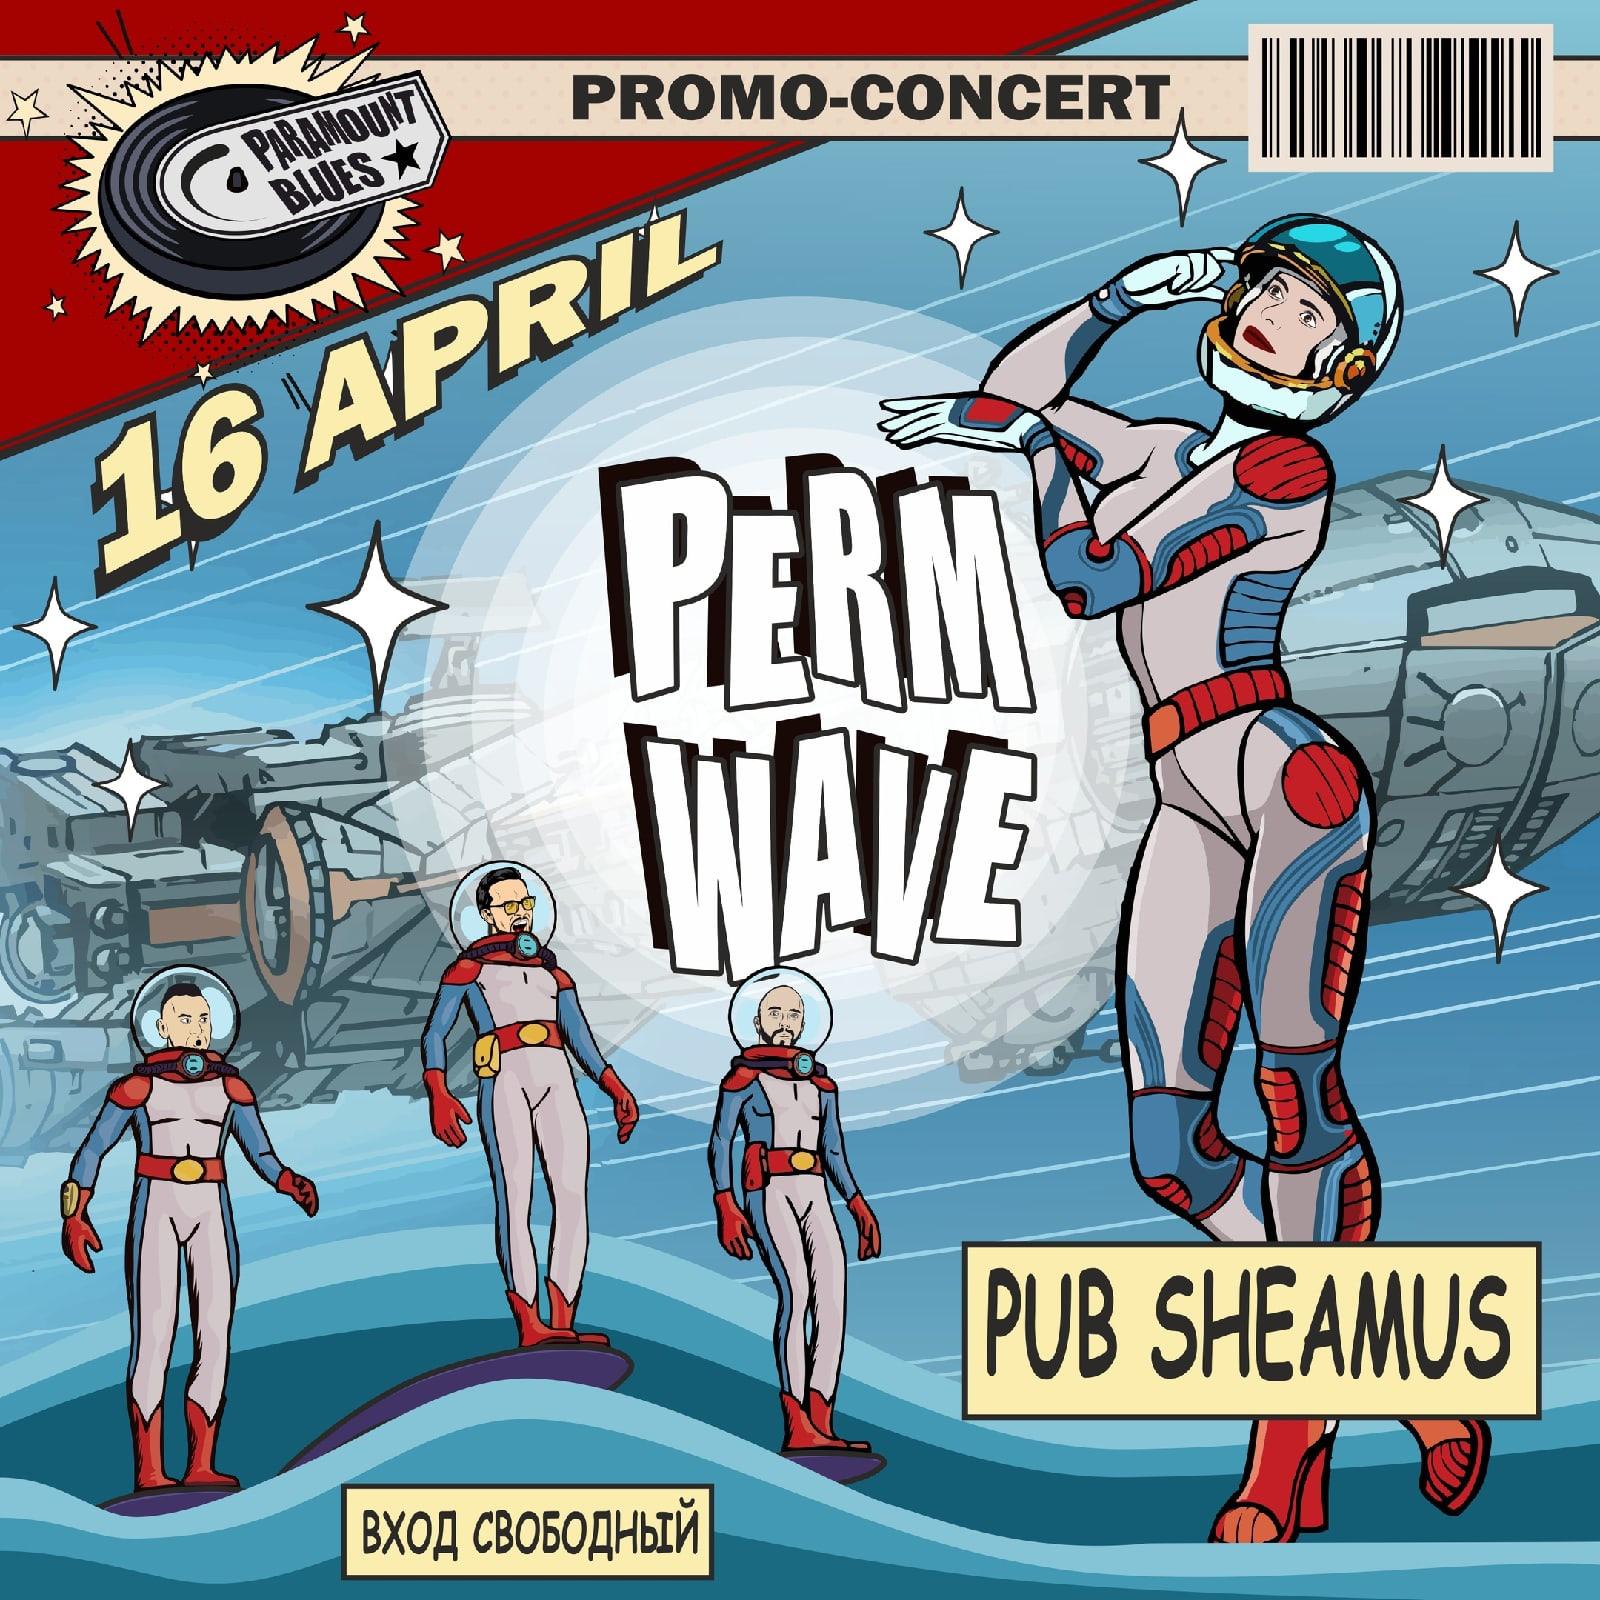 16.04 Paramount Blues в пабе Sheamus!